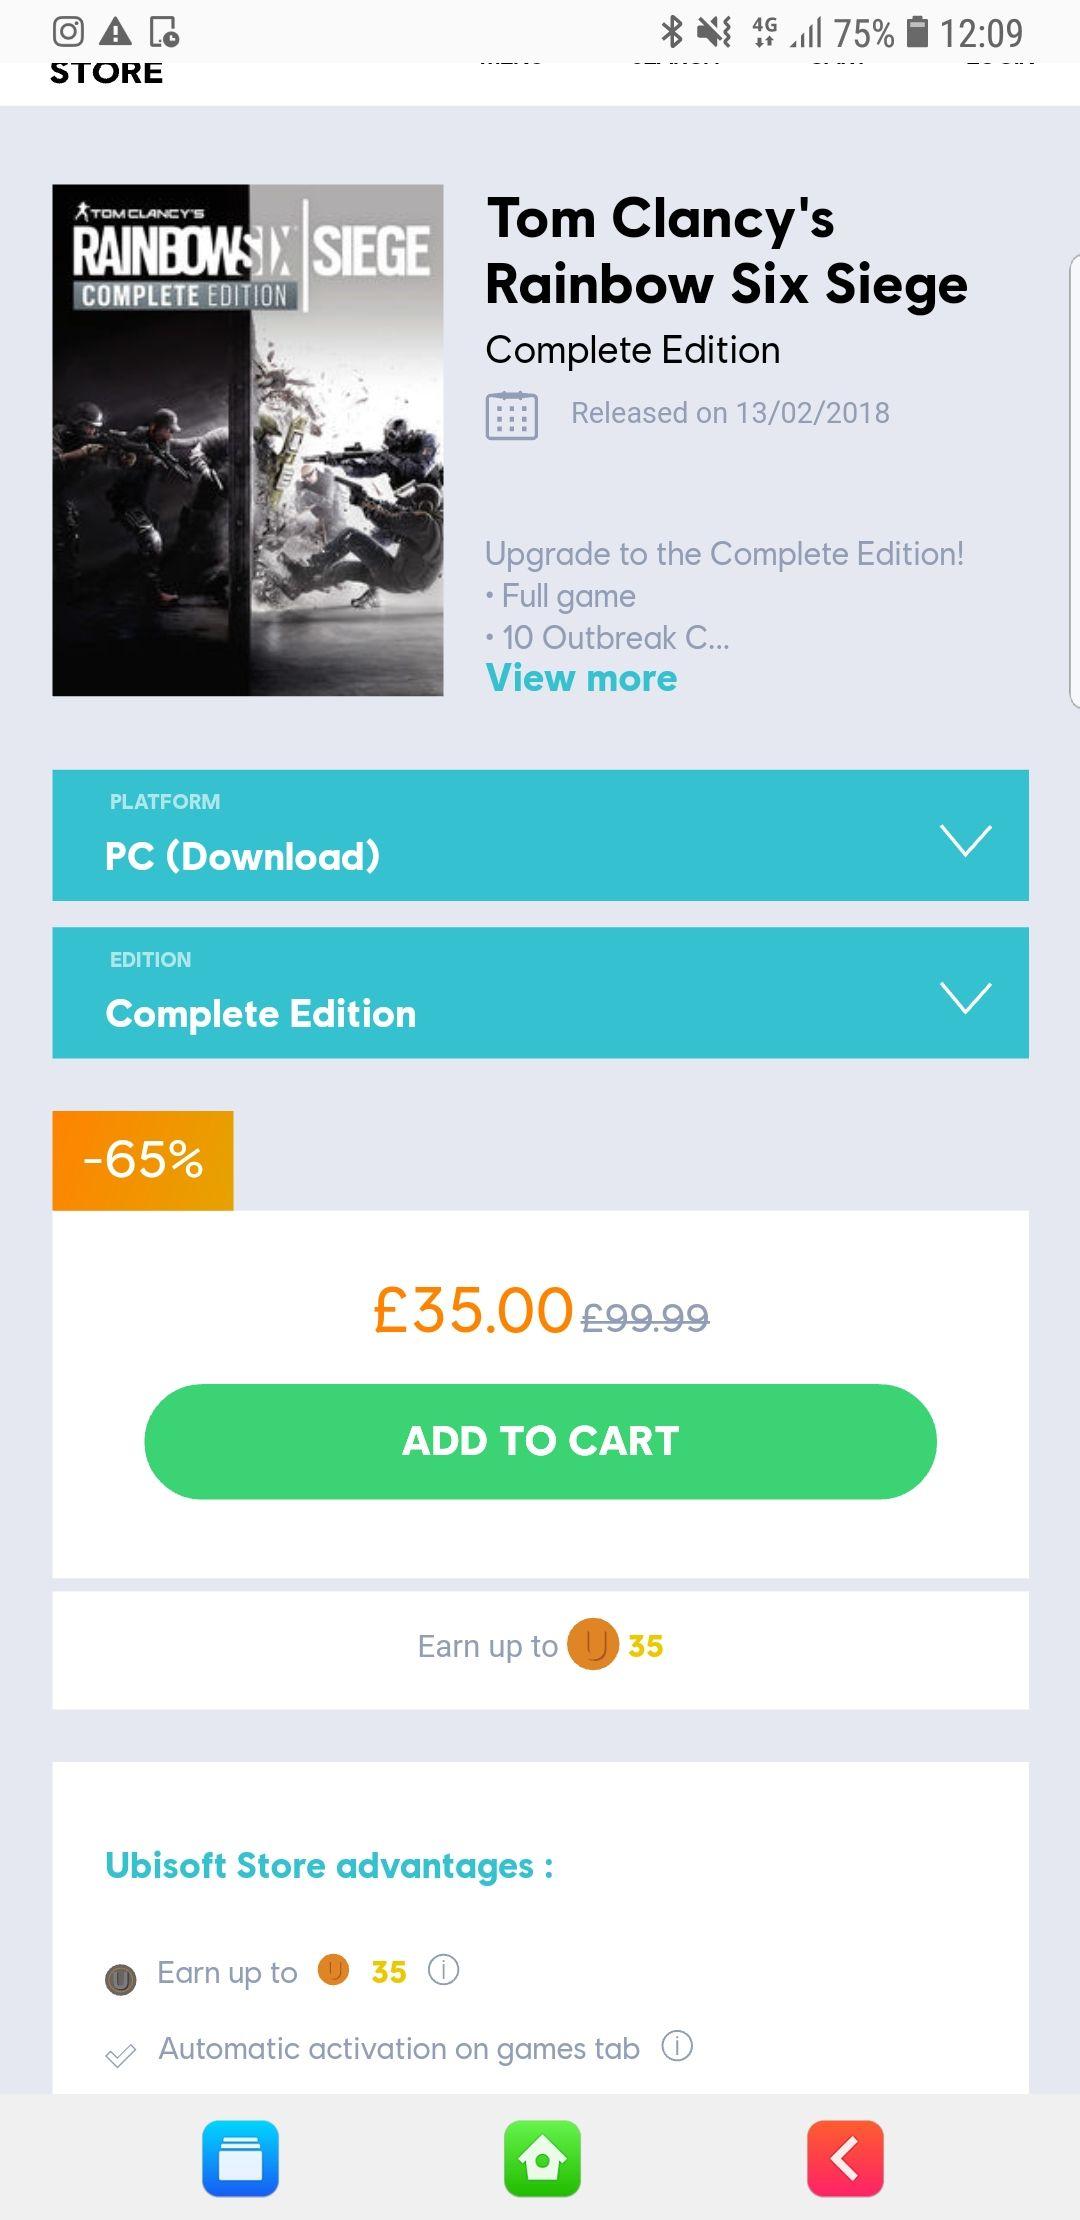 Rainbow six siege complete edition (PC Download) - £35 @ Ubi Store